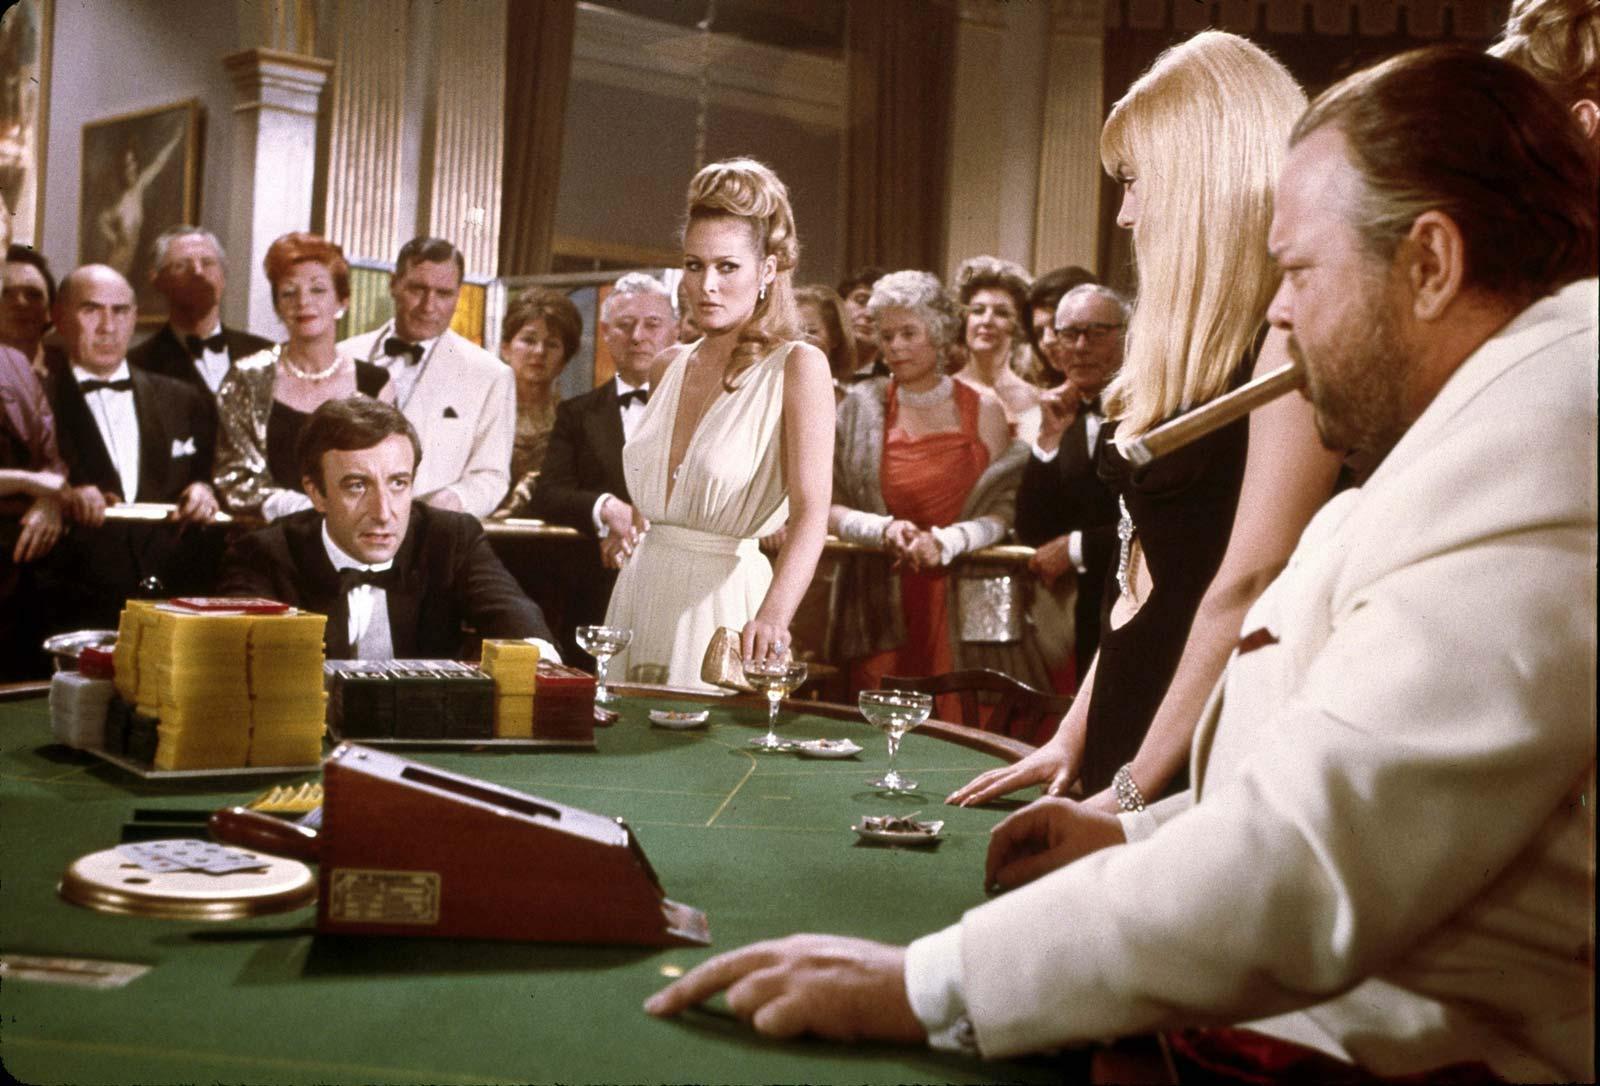 Casino scene cash casino game money play premio